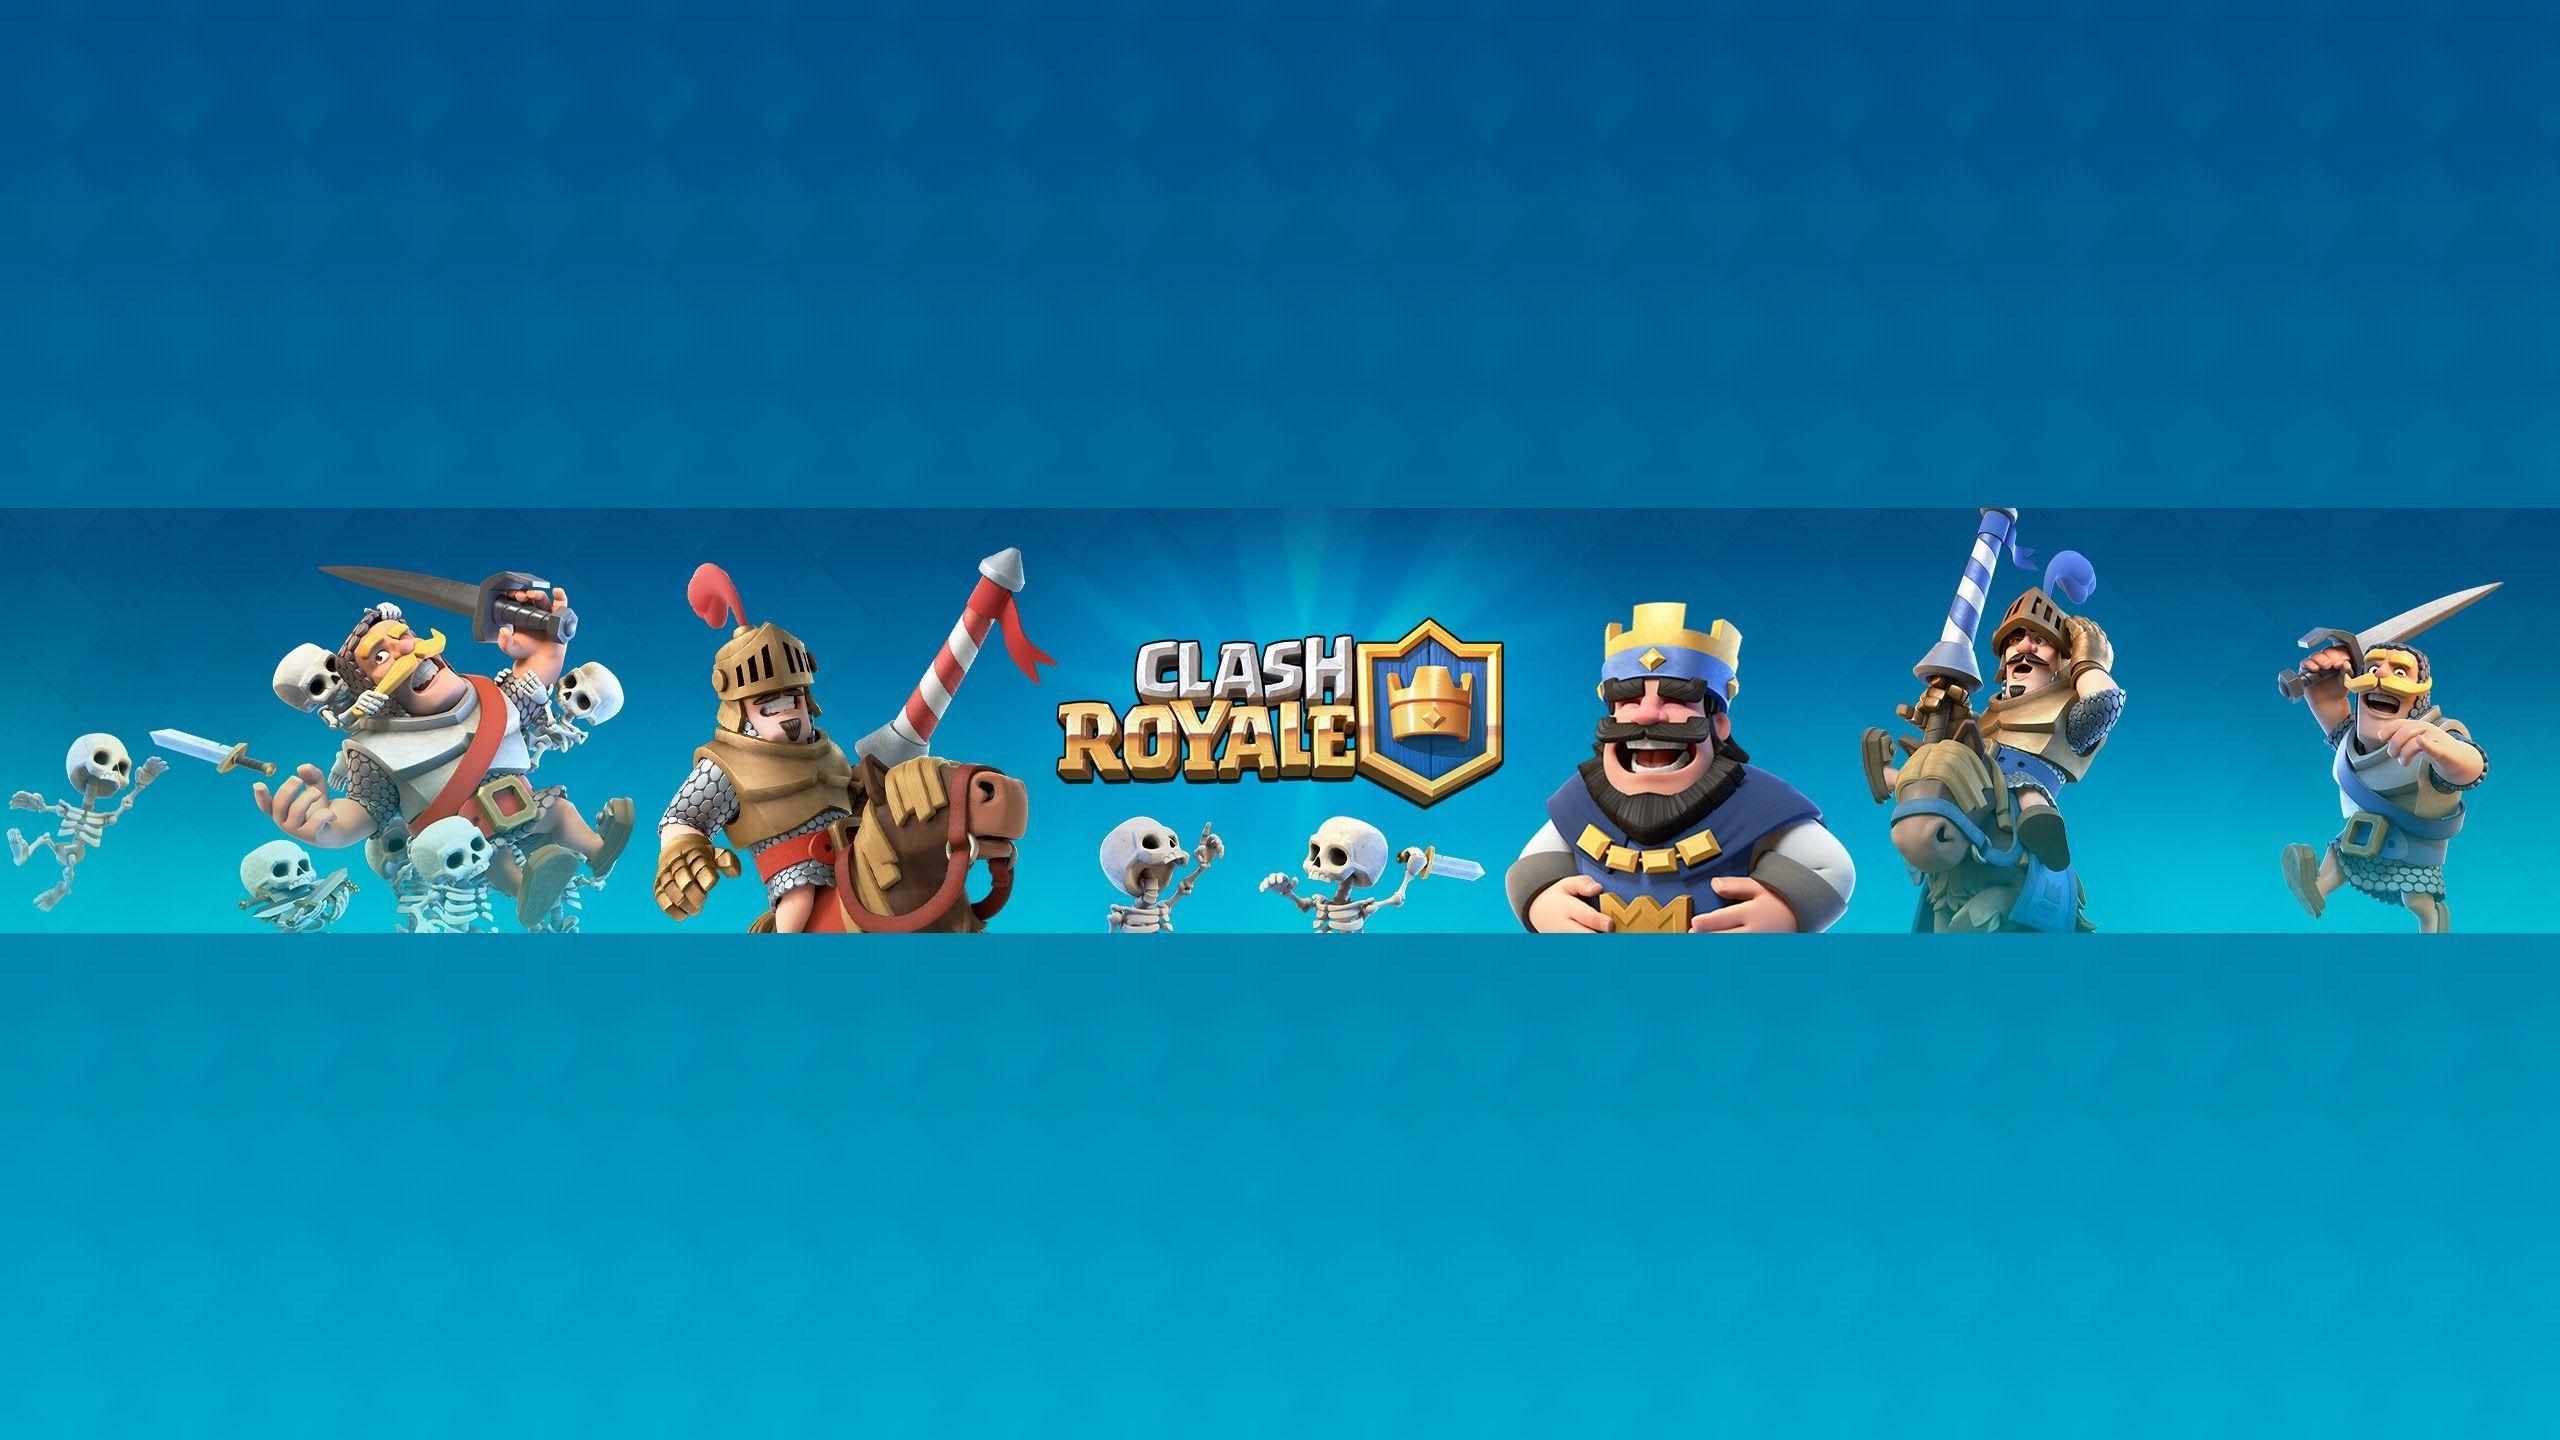 Clash Royale Wallpaper UHD | Wallpaper Zone